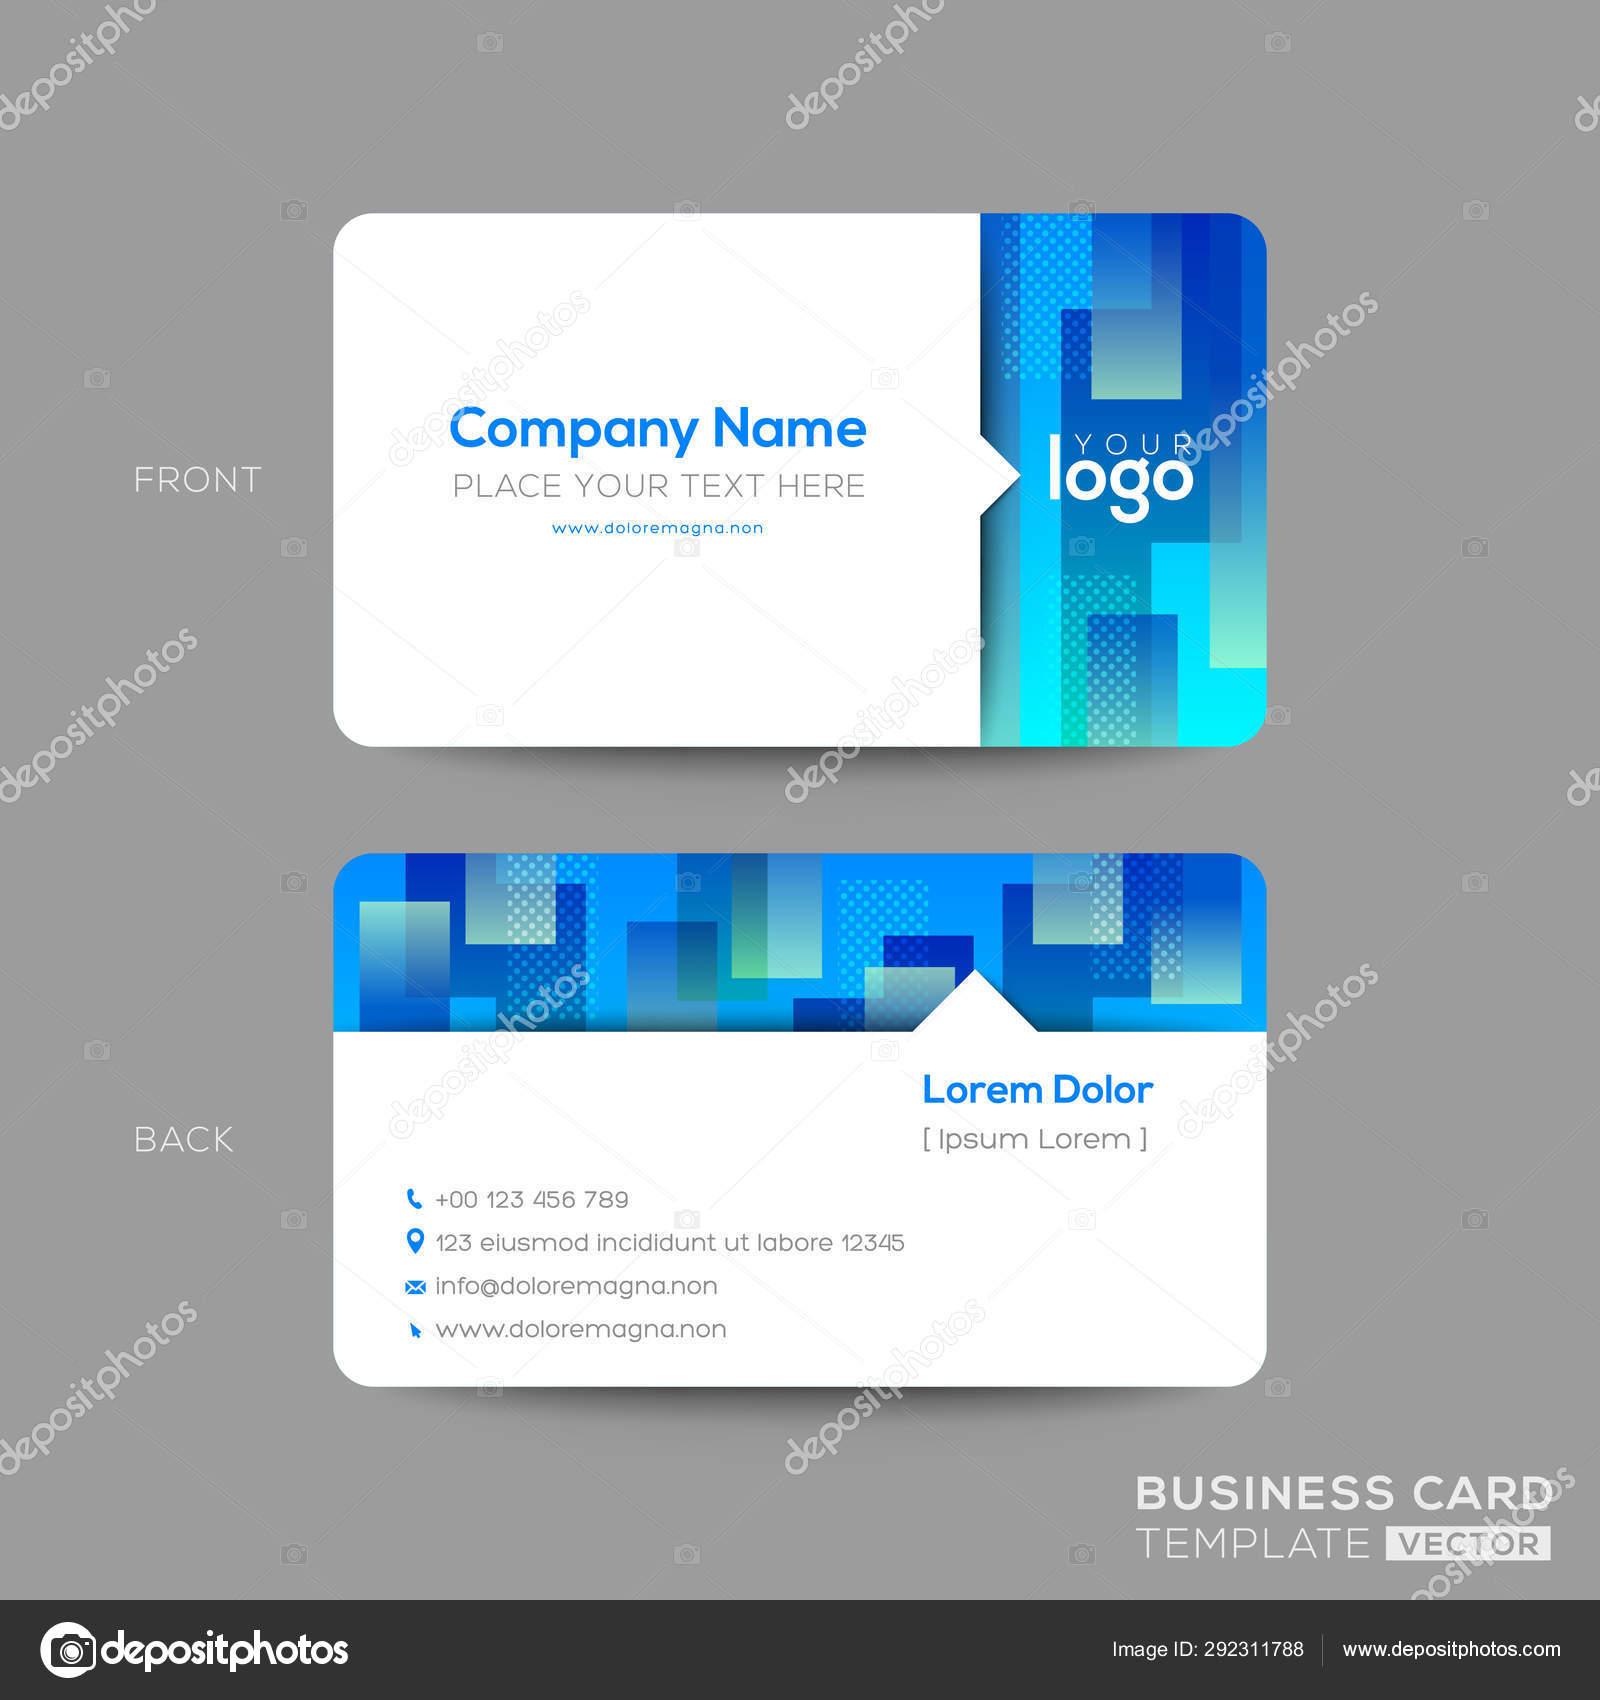 Blue business card, membership card, VIP club card template with Within Template For Membership Cards